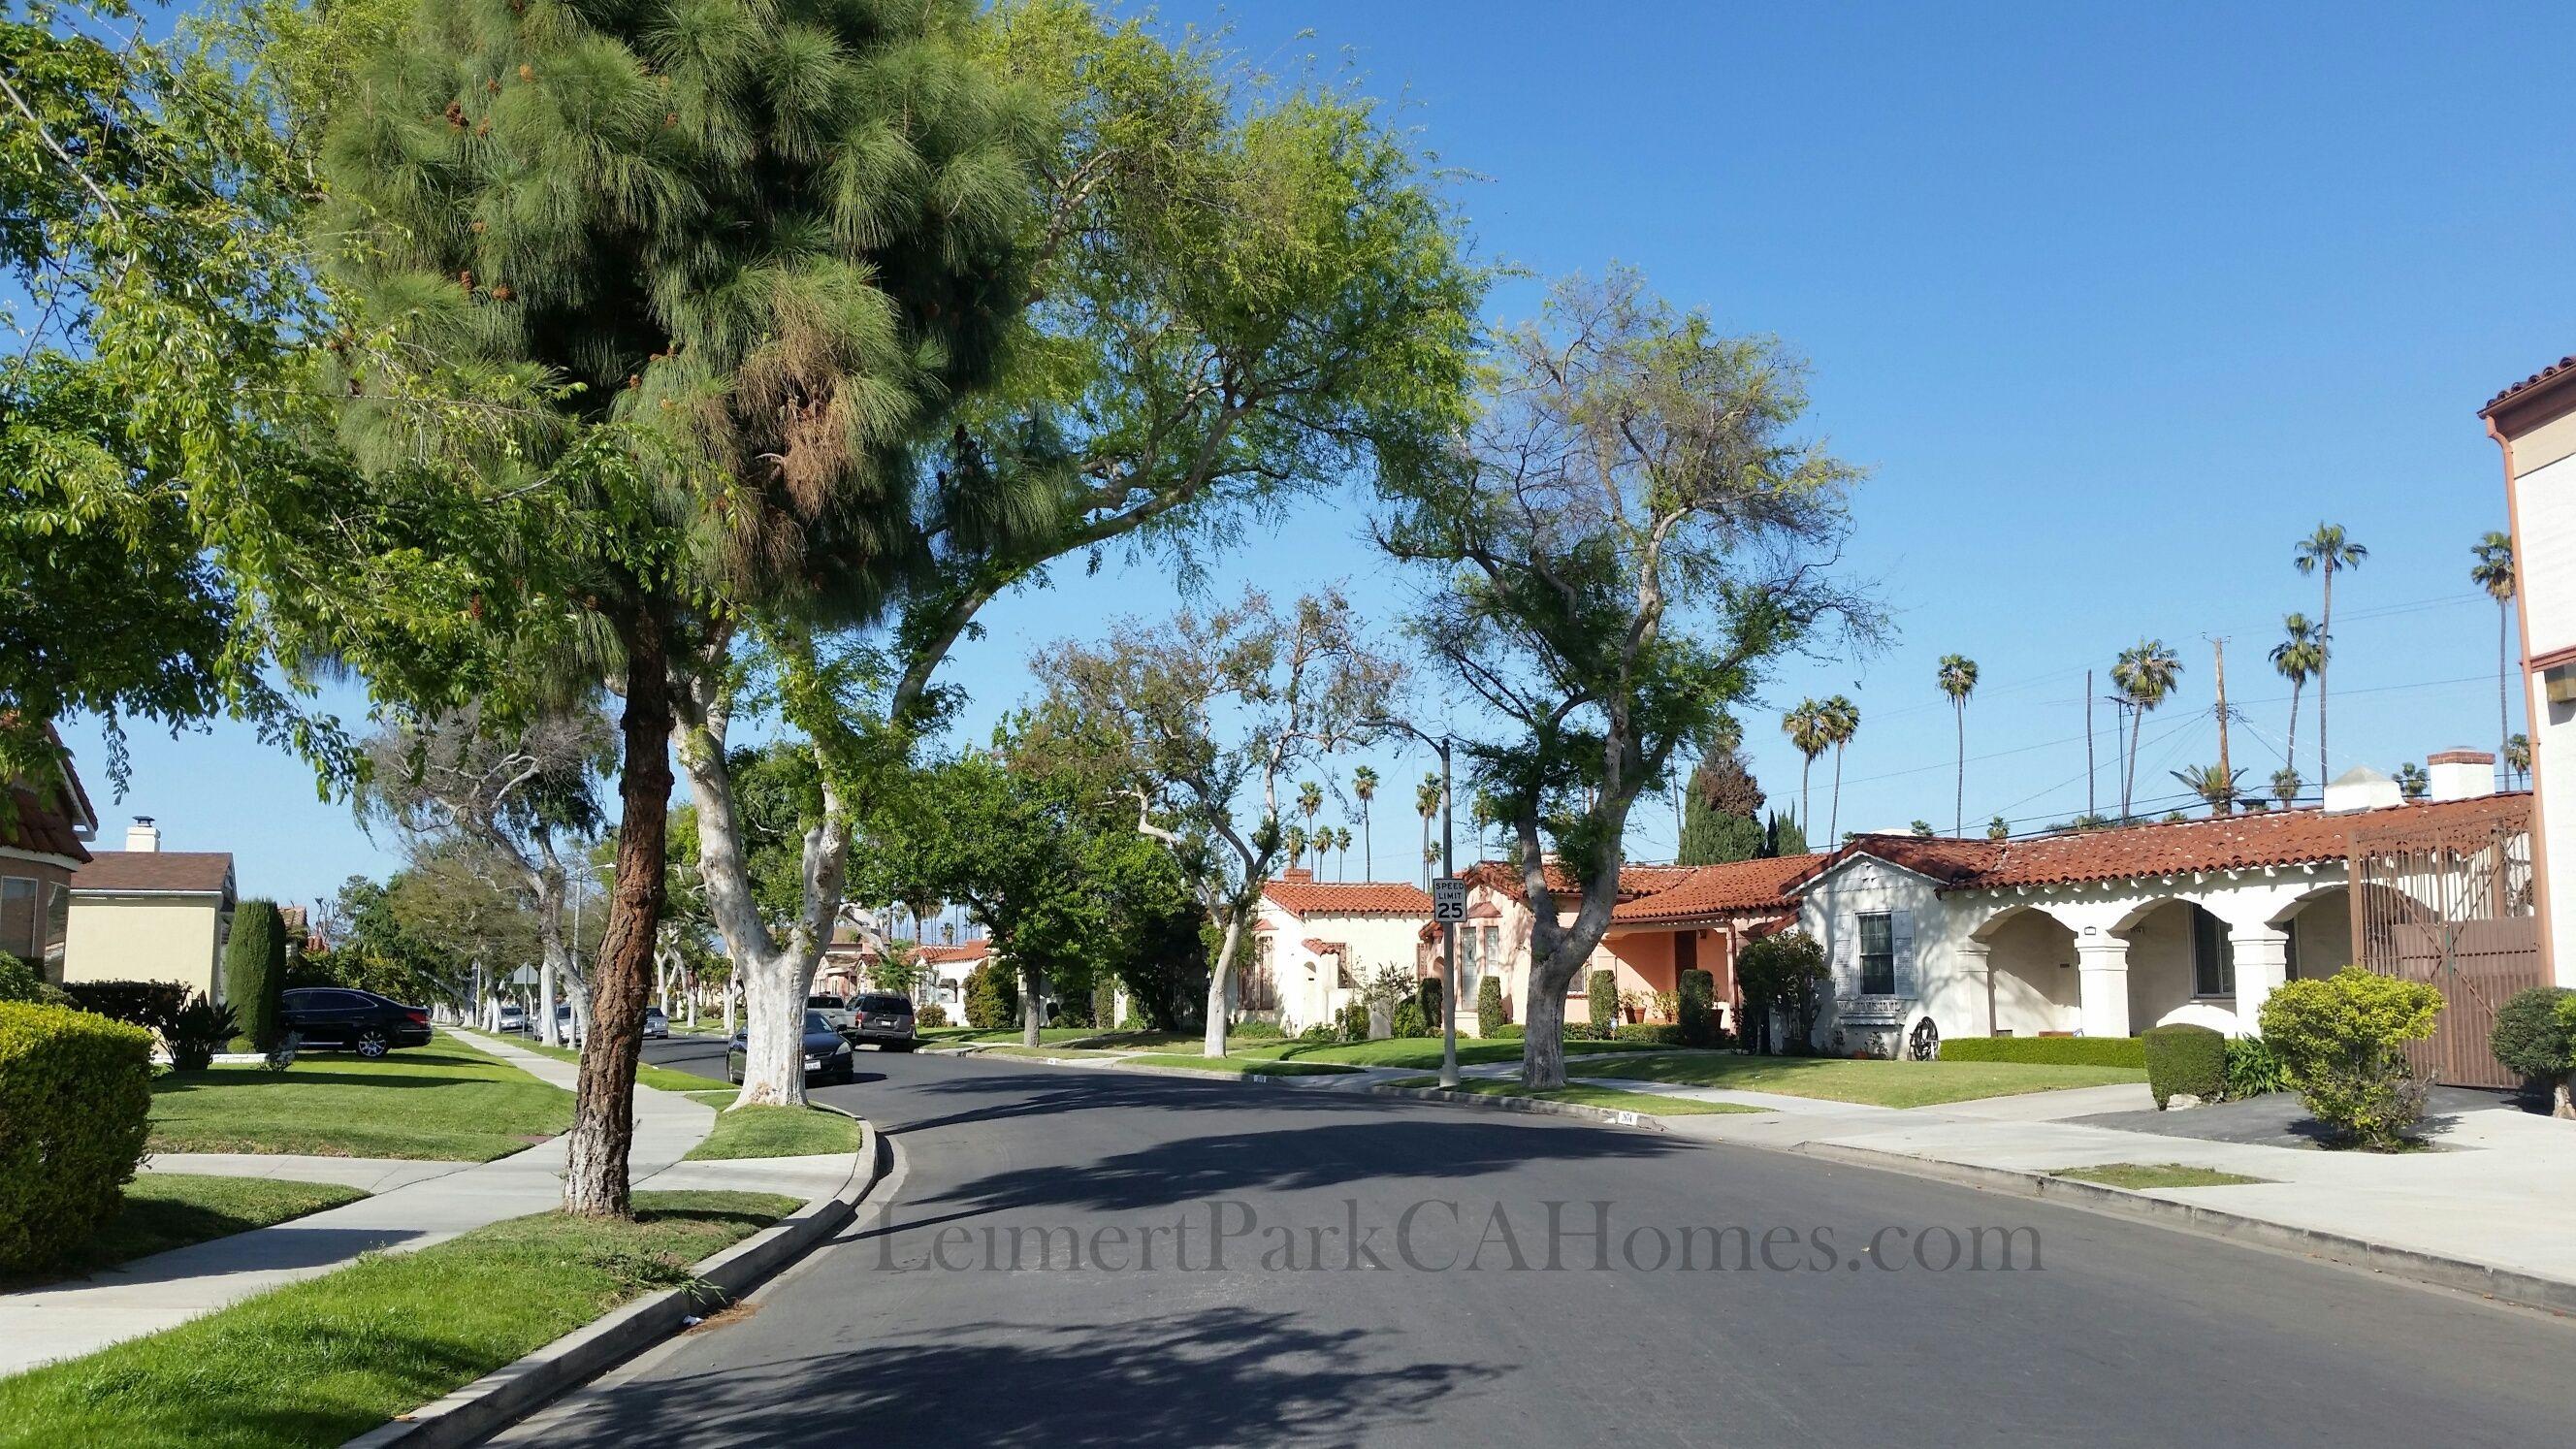 Leimert Park, Los Angeles, CA